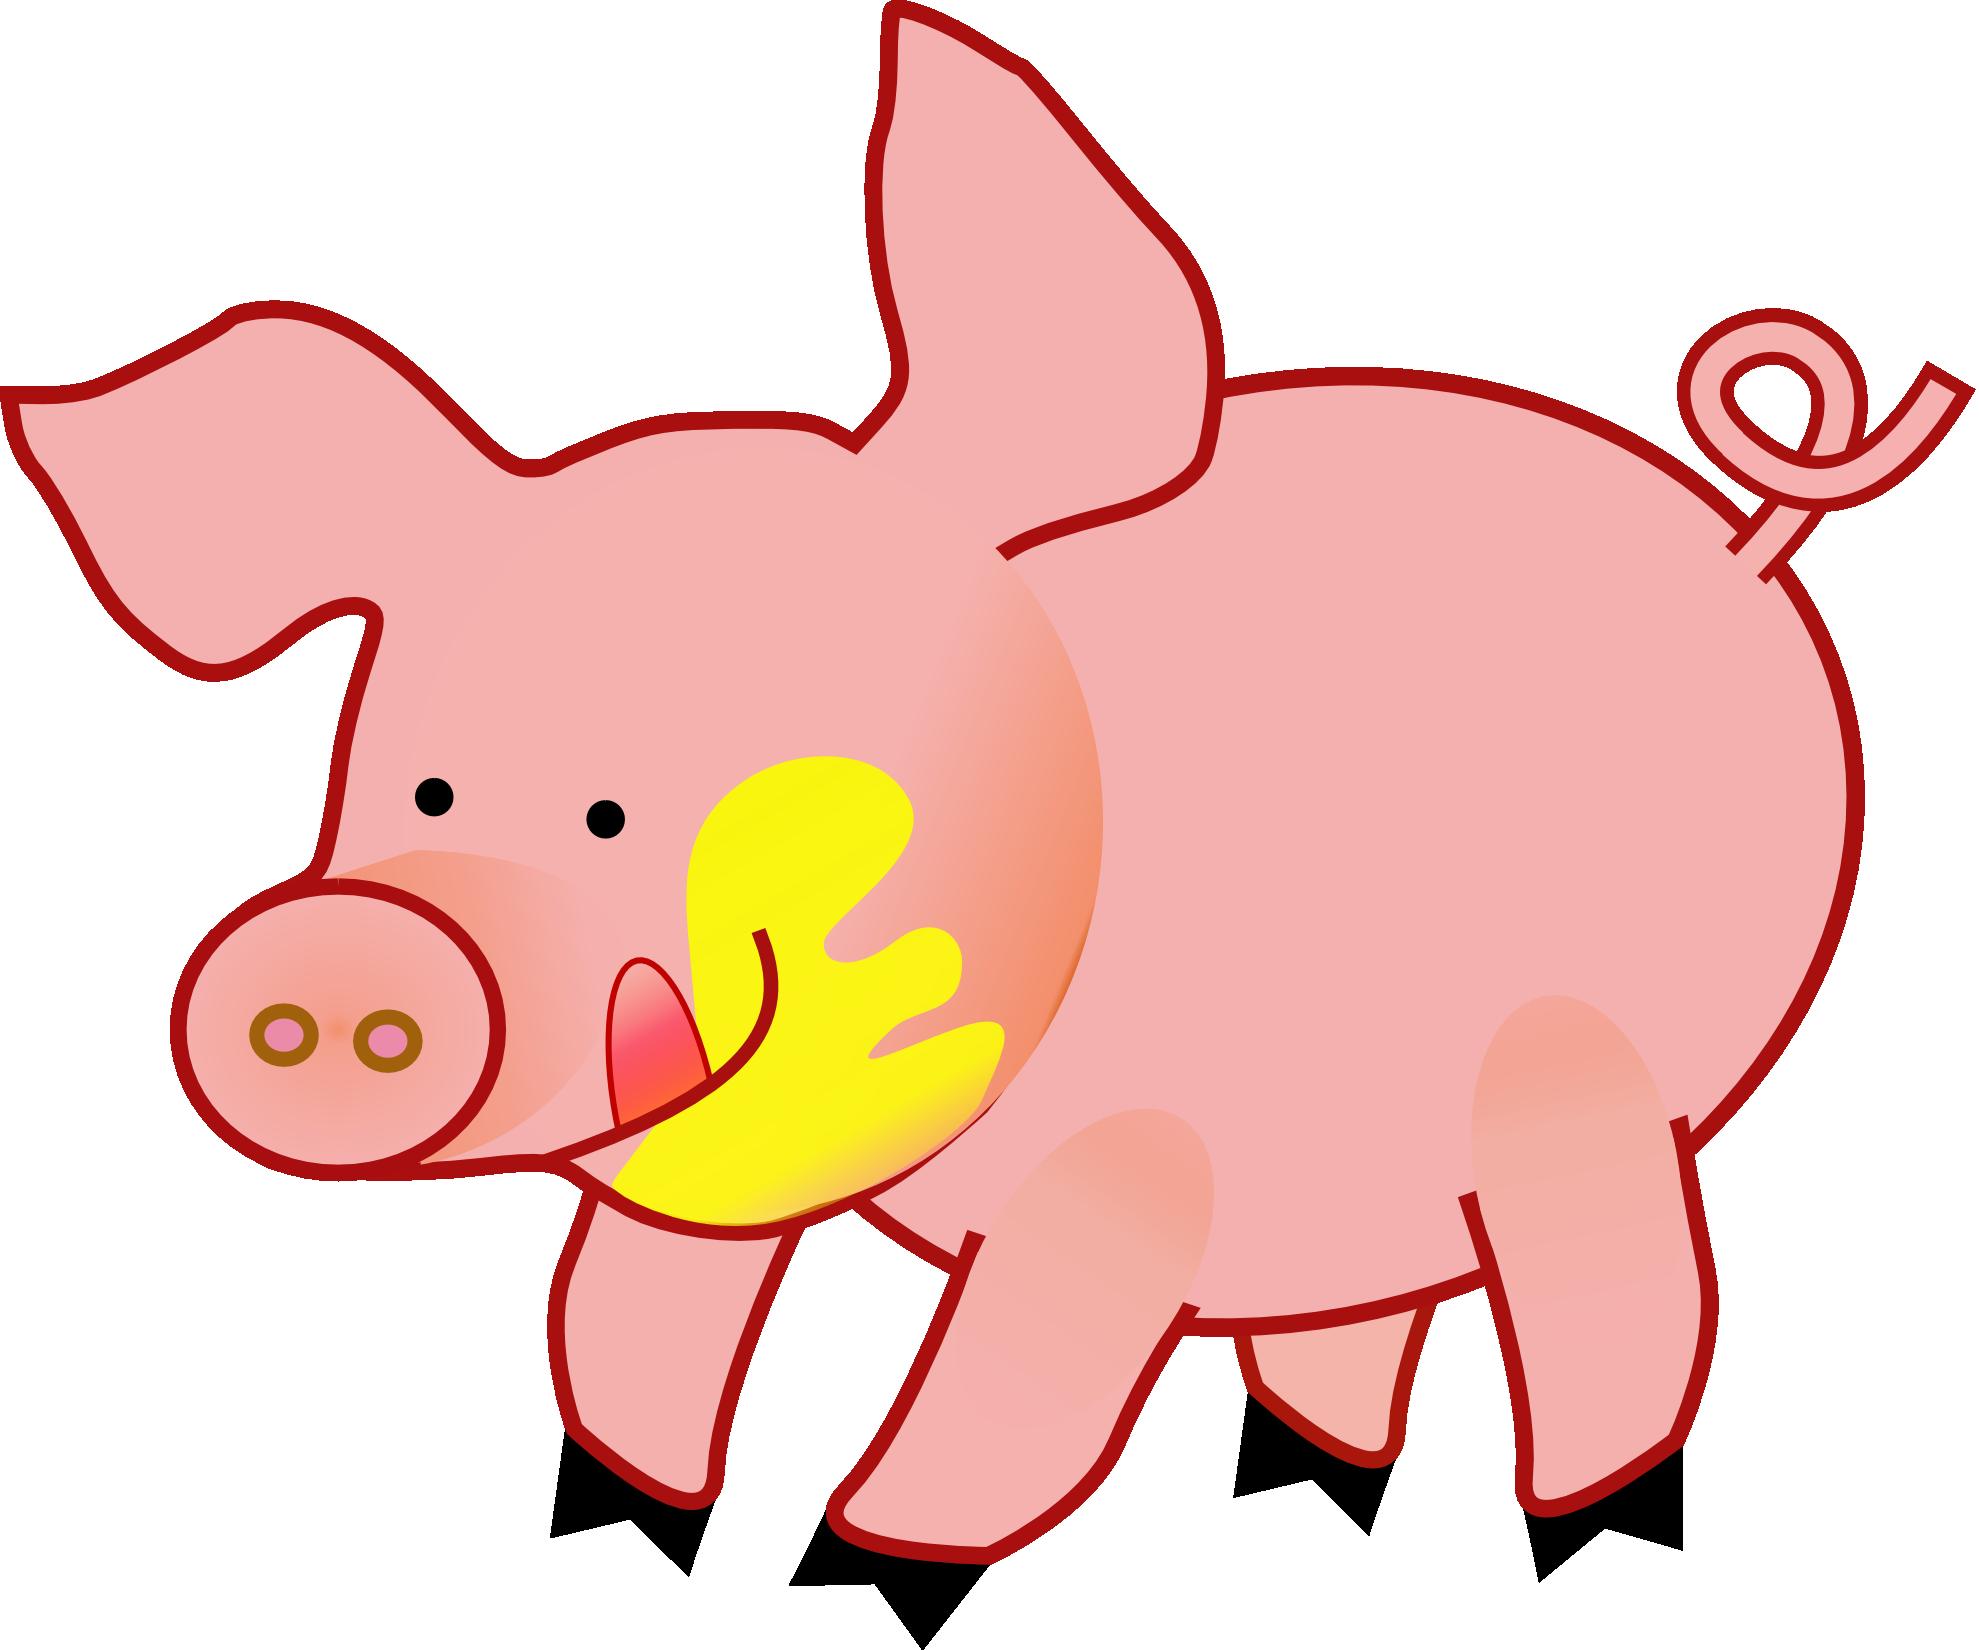 pig clipart-pig clipart-11